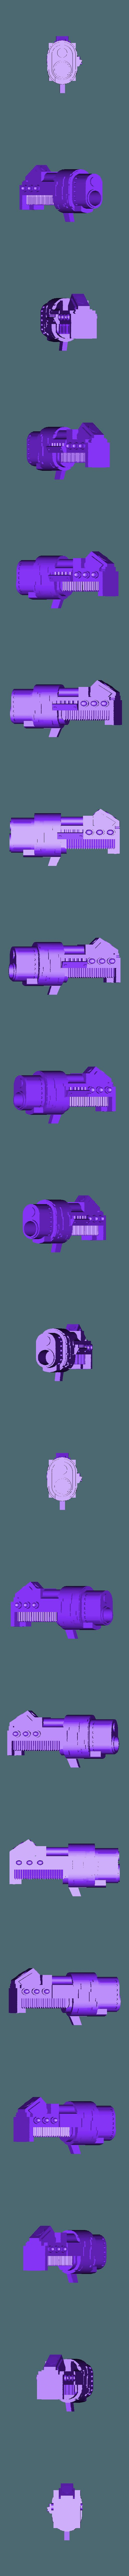 Plasma_Cannon.stl Download free STL file Imperial Crusader Mech - New Legs • 3D printable model, GarinC3D